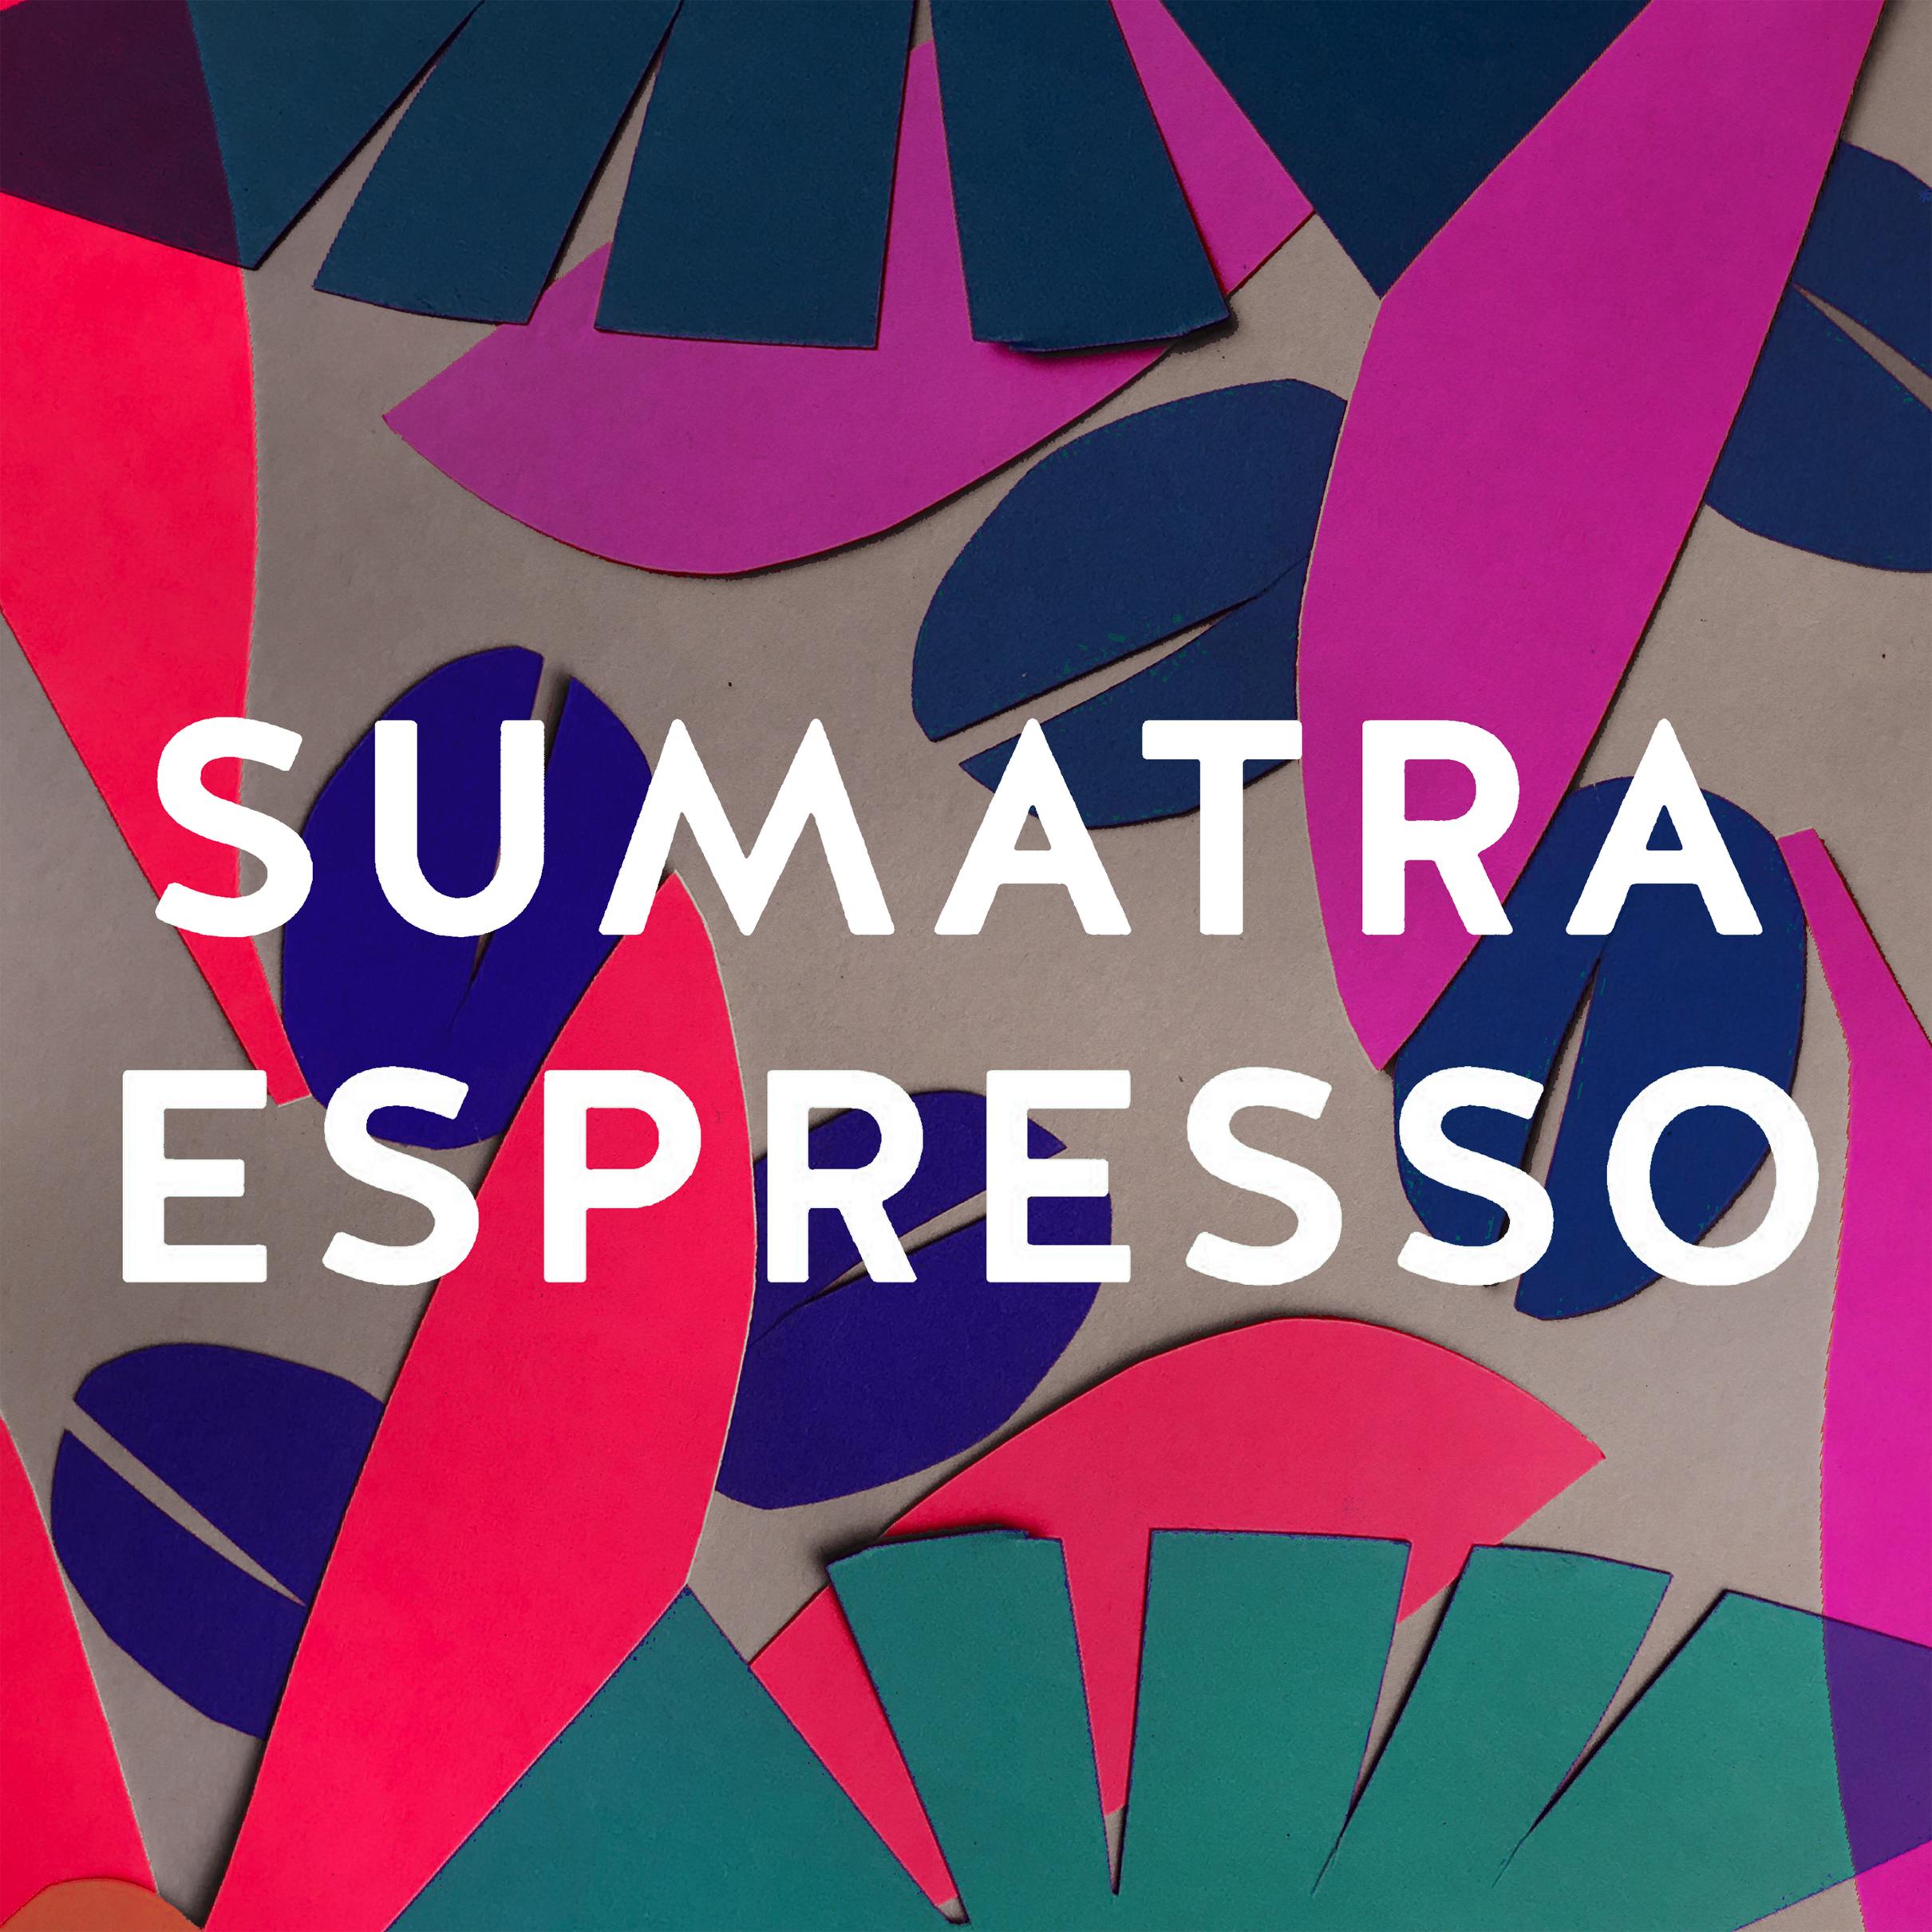 stina-persson-sumatra-espresso-coffee.jpg